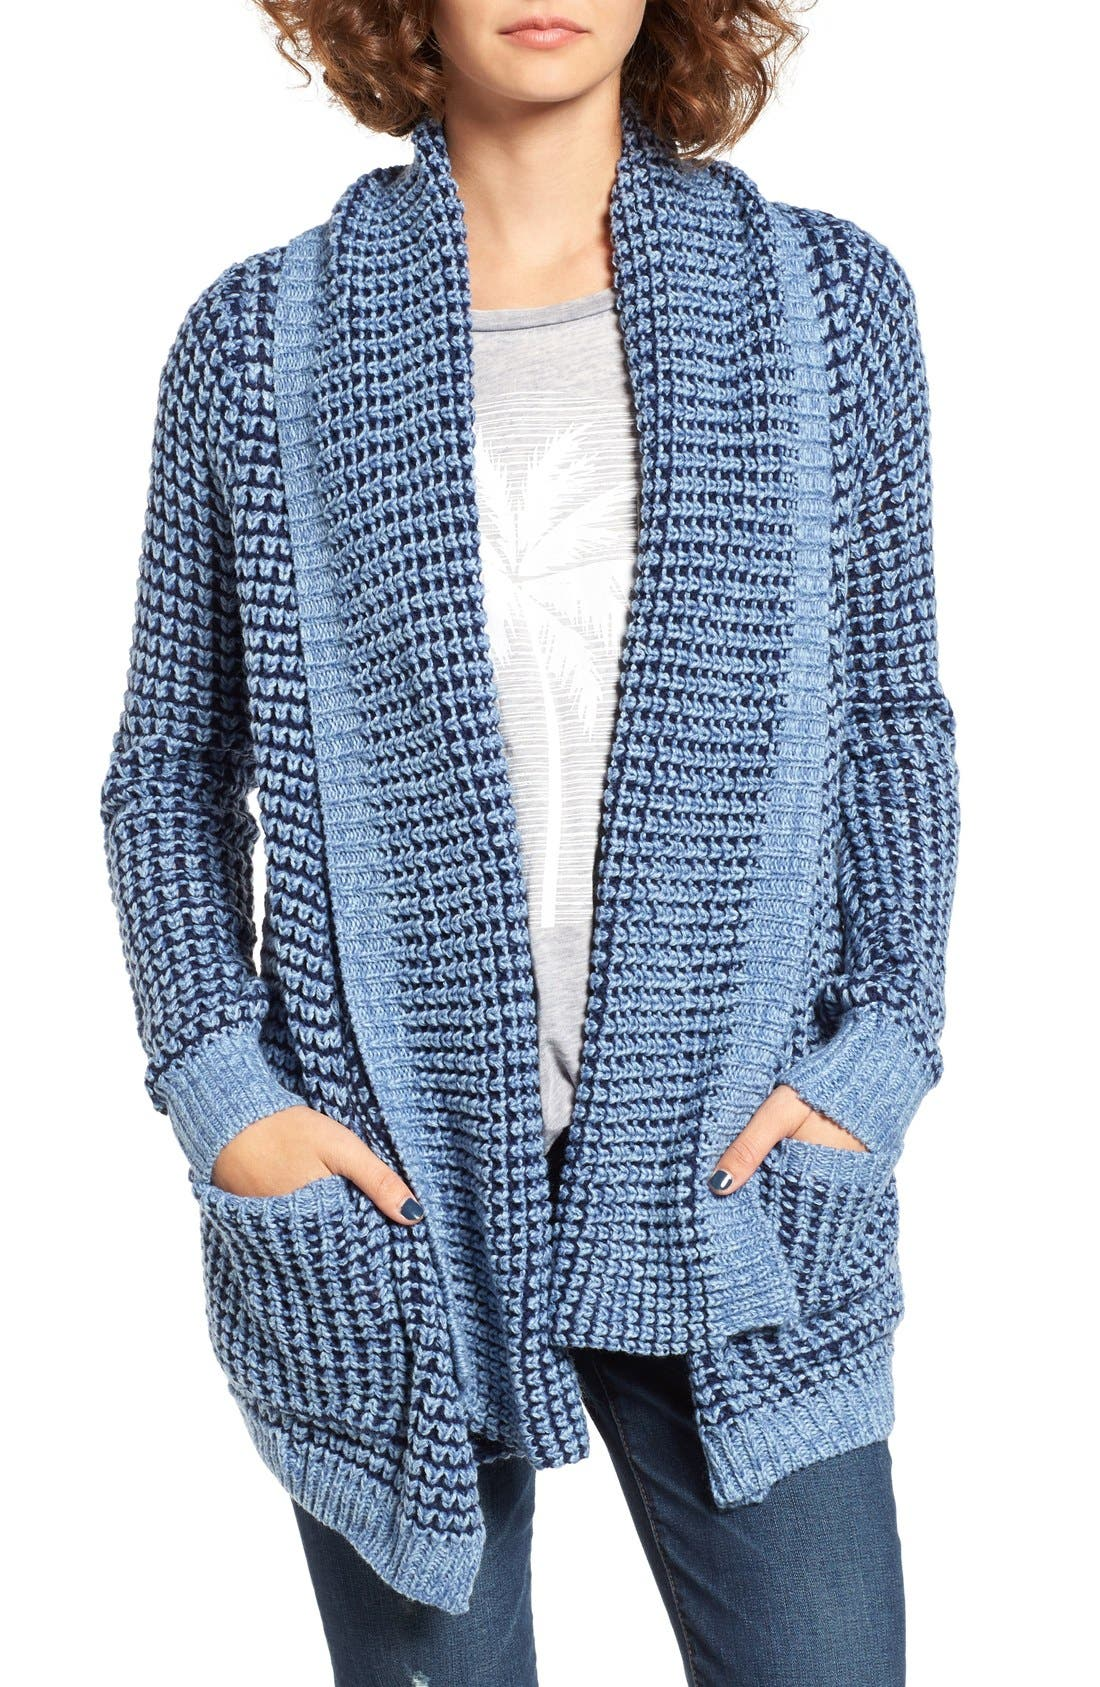 Alternate Image 1 Selected - Rip Curl Shambala Knit Cardigan